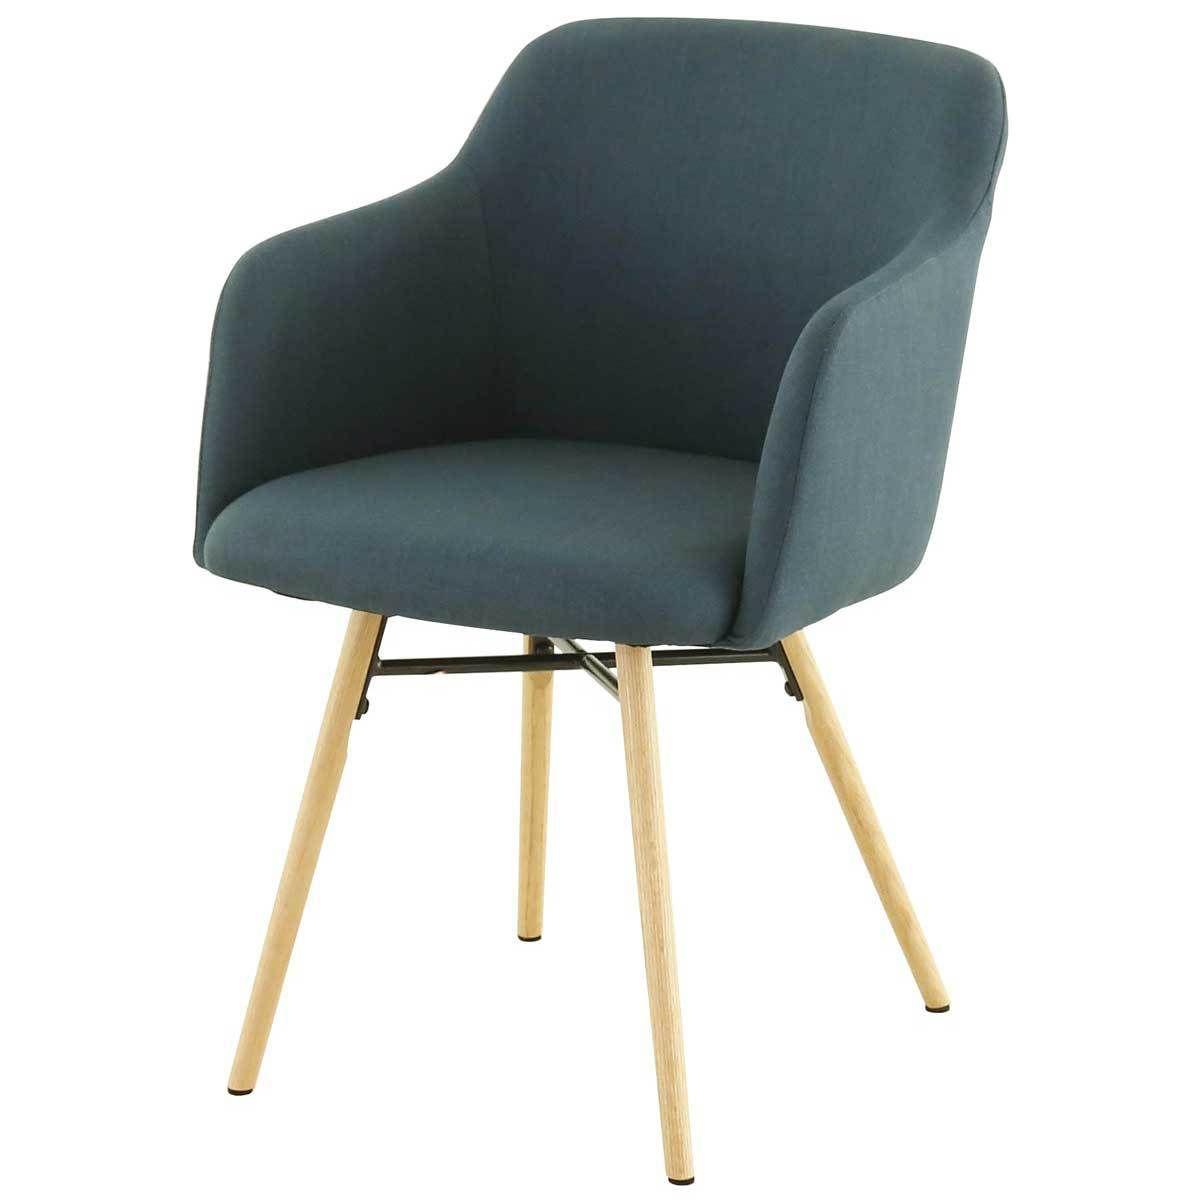 Chaise May avec Accoudoirs - Bleu Canard | Accoudoir, Bleu canard ...